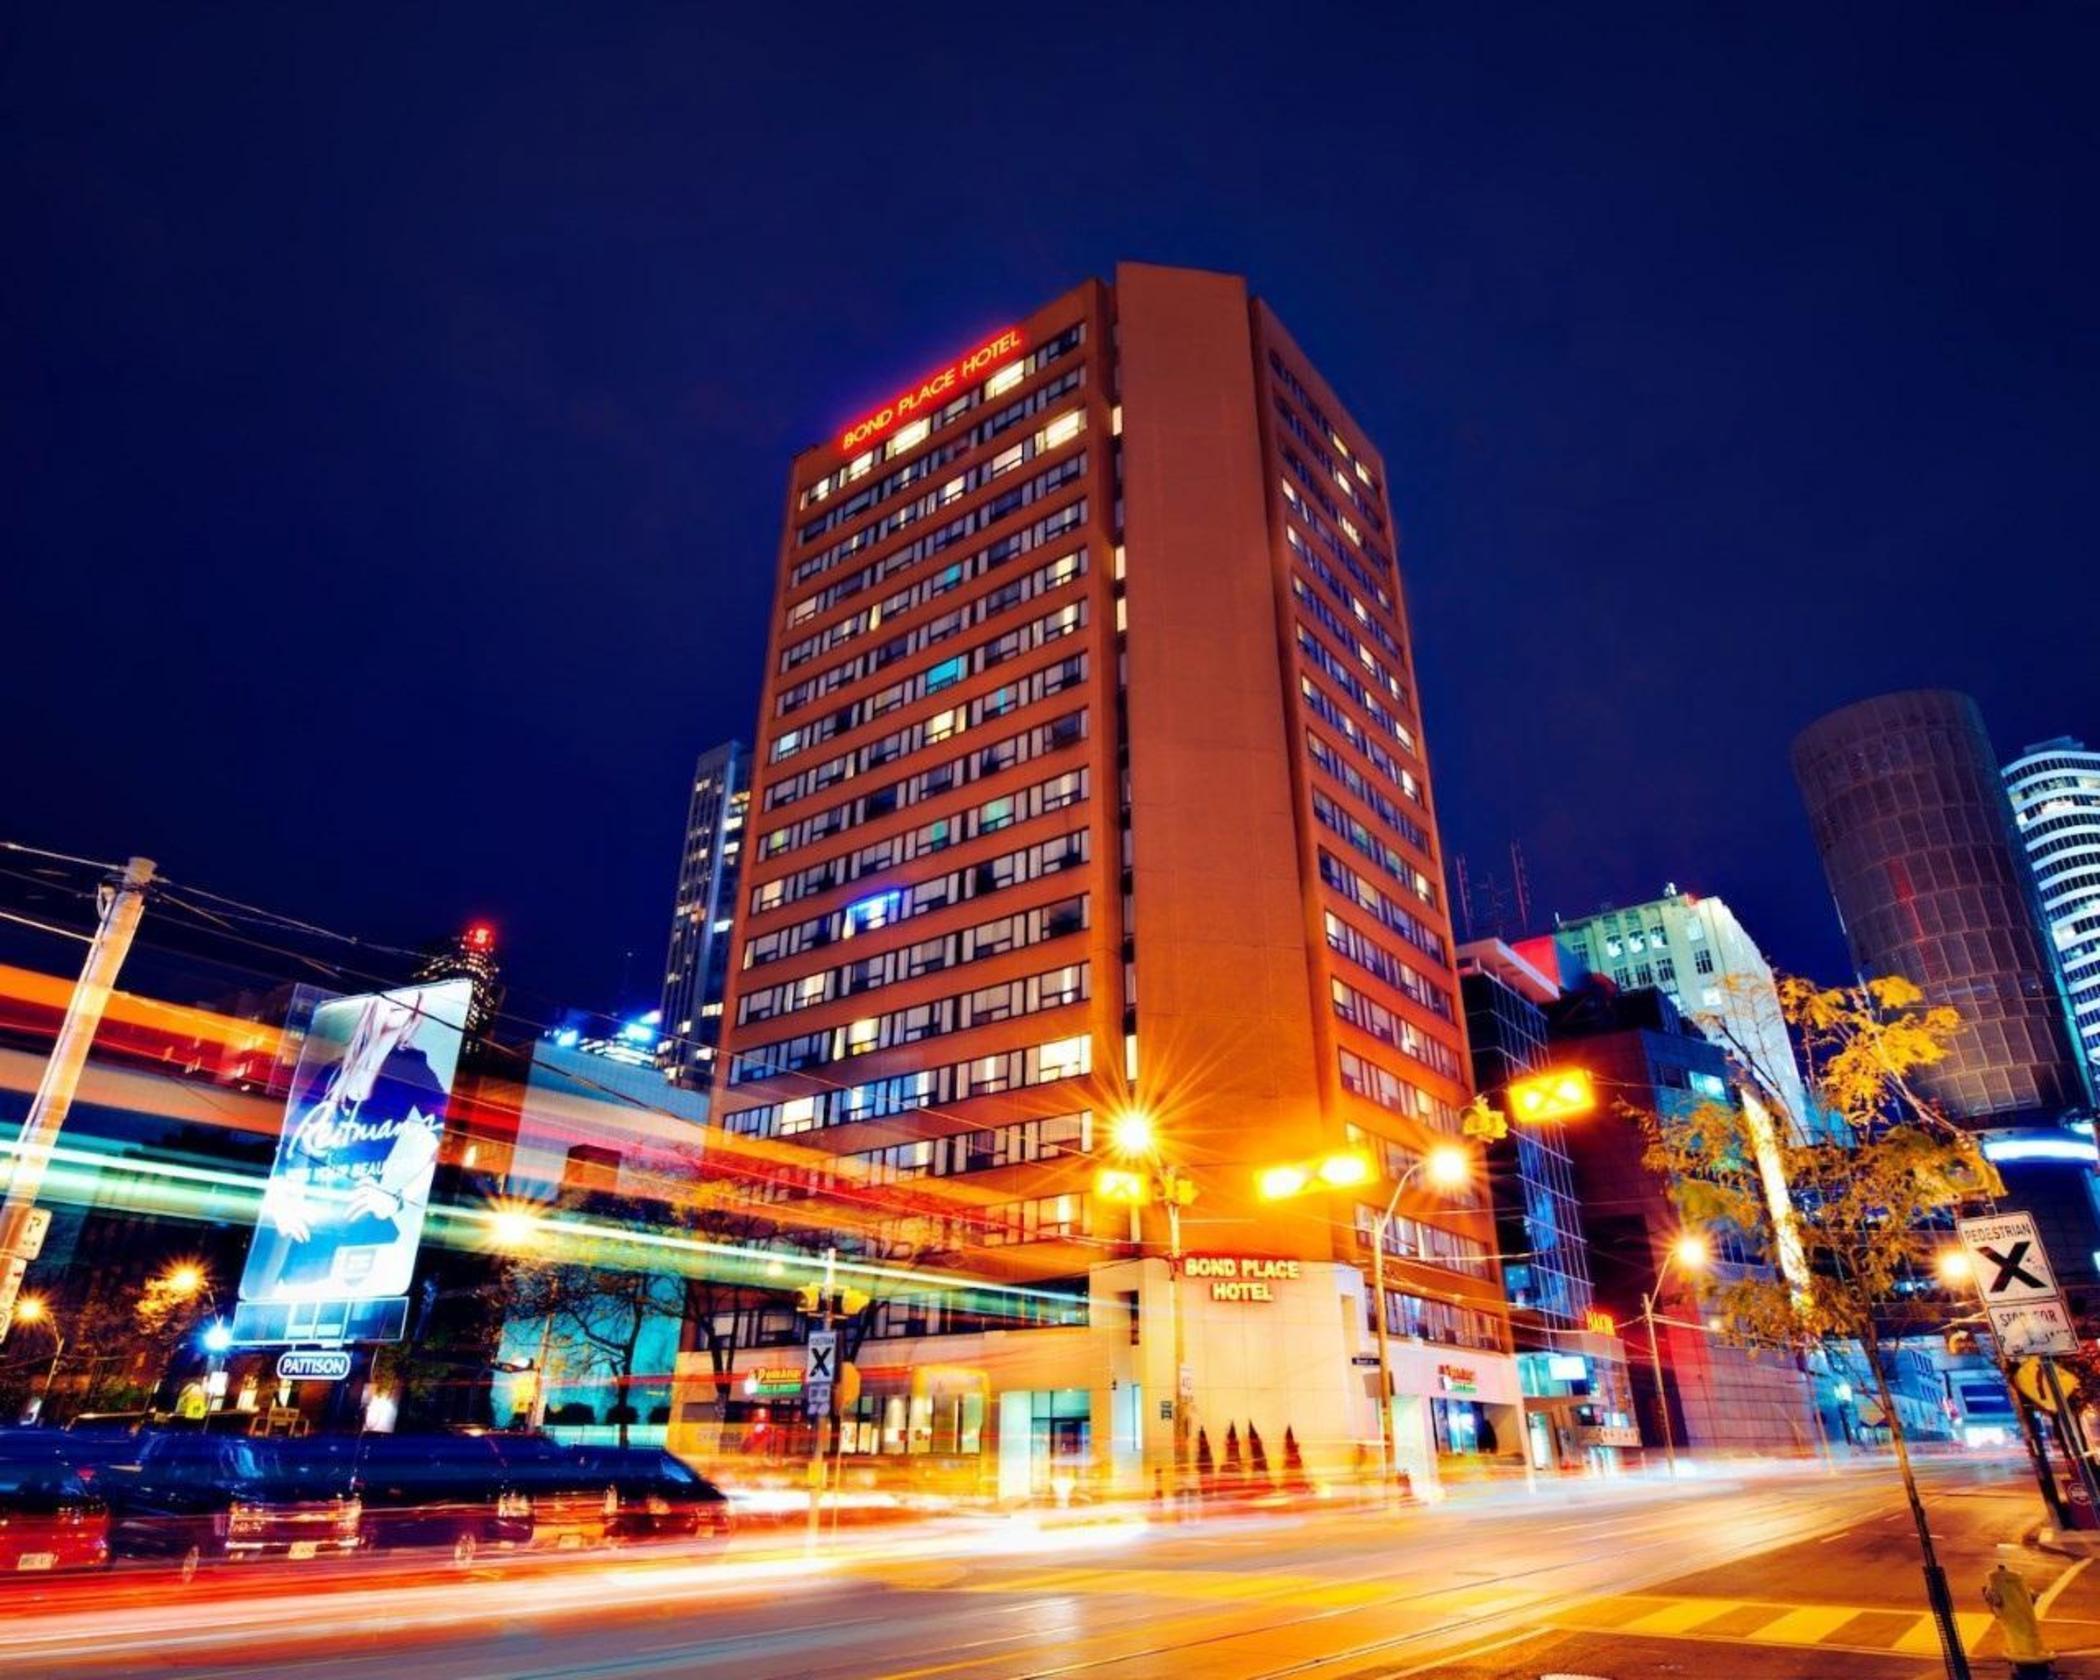 Bond Place Hotel Toronto, Toronto